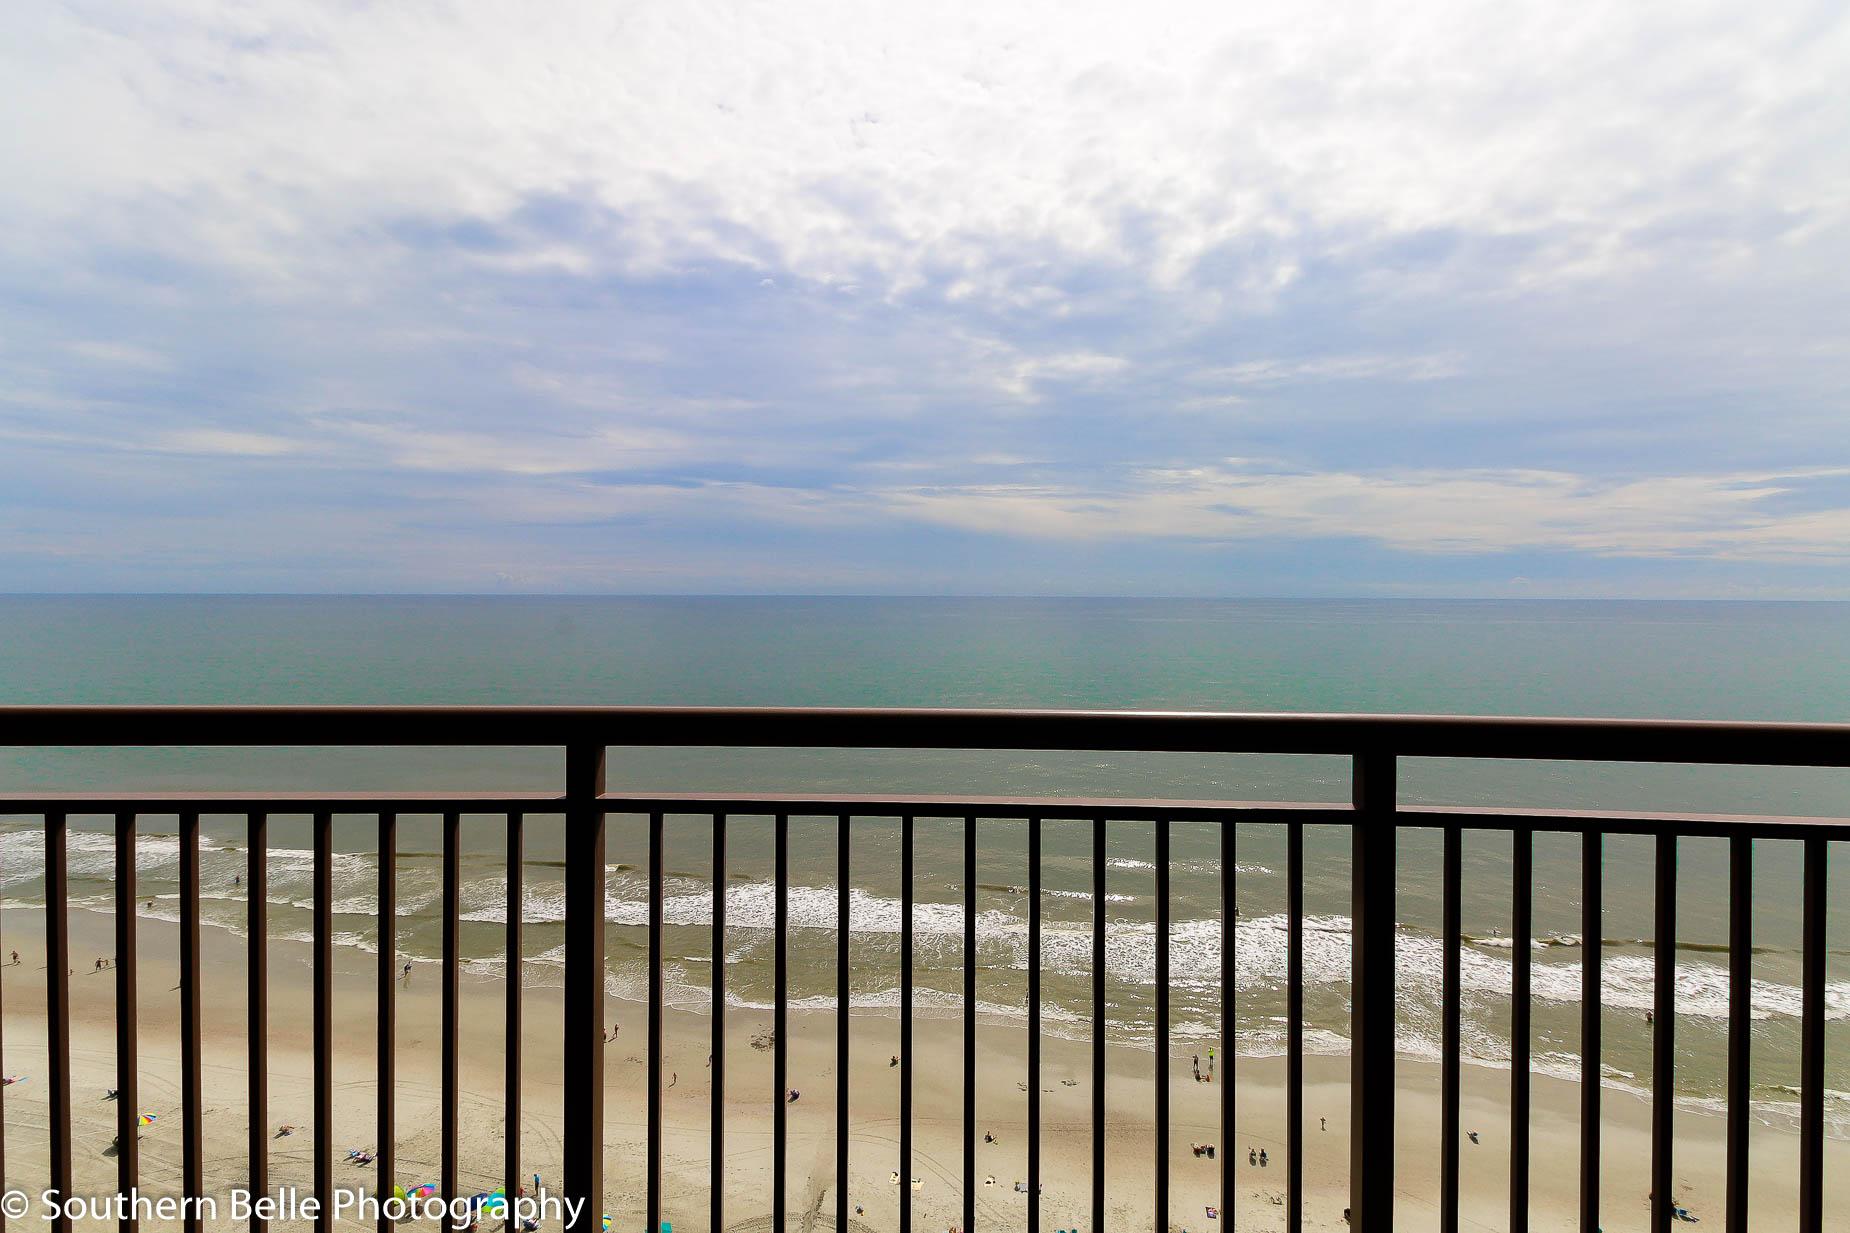 19. Bal. View of the Ocean WM